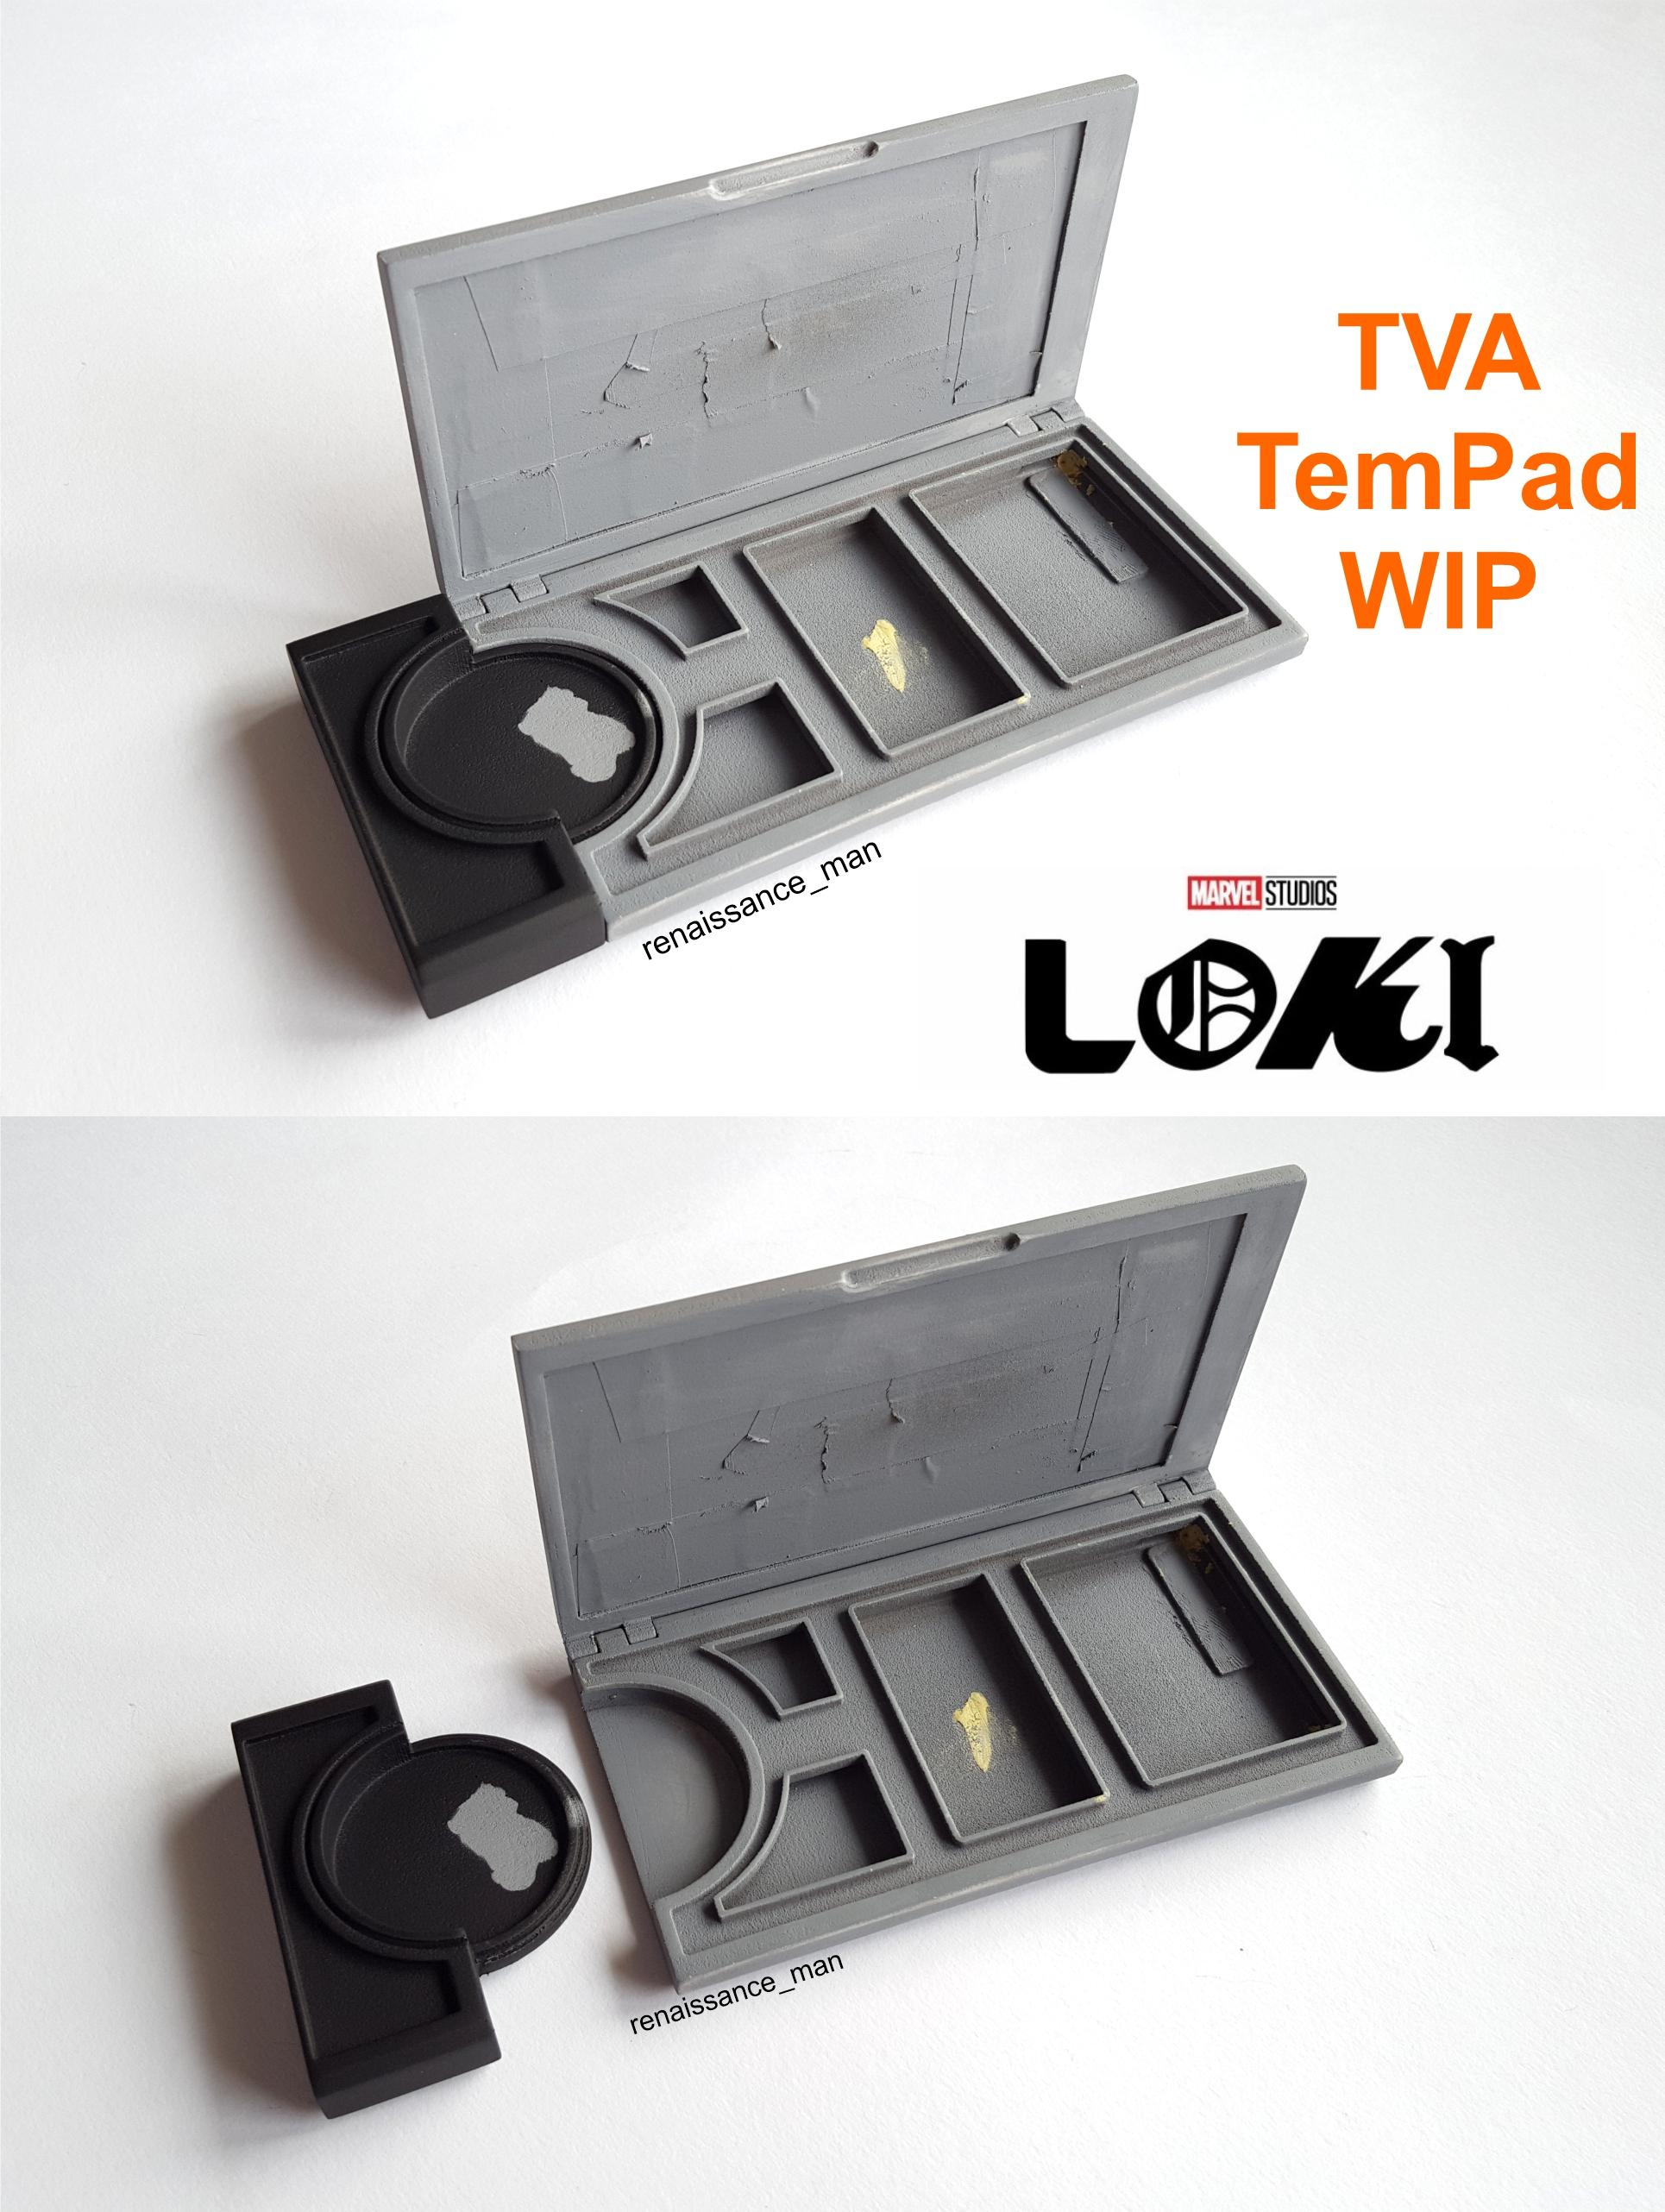 TVA-Tem-Pad-WIP-5.jpg